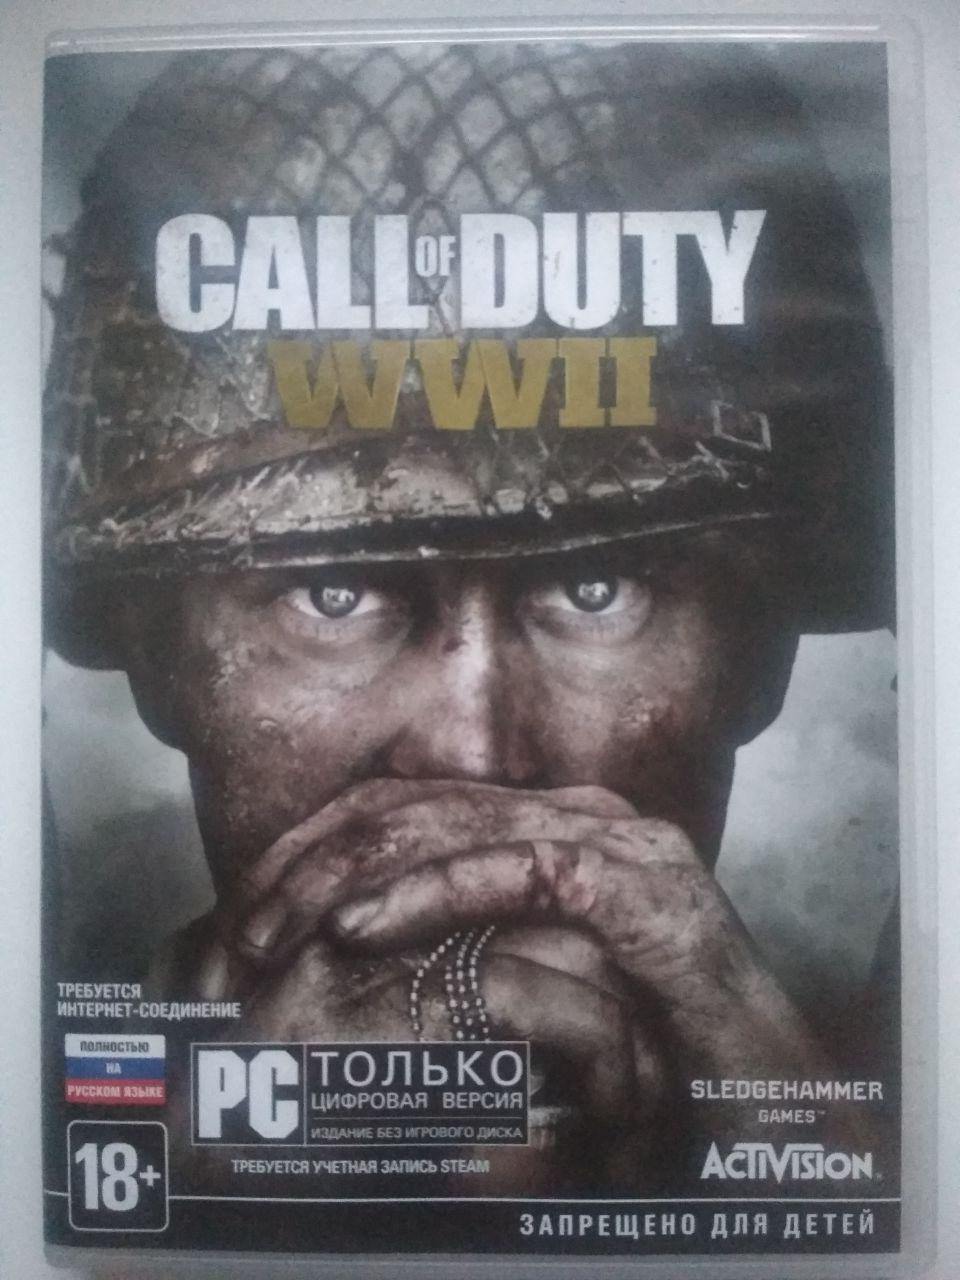 Call of Duty: WWII (STEAM KEY) RU+CIS + GIFT 2019